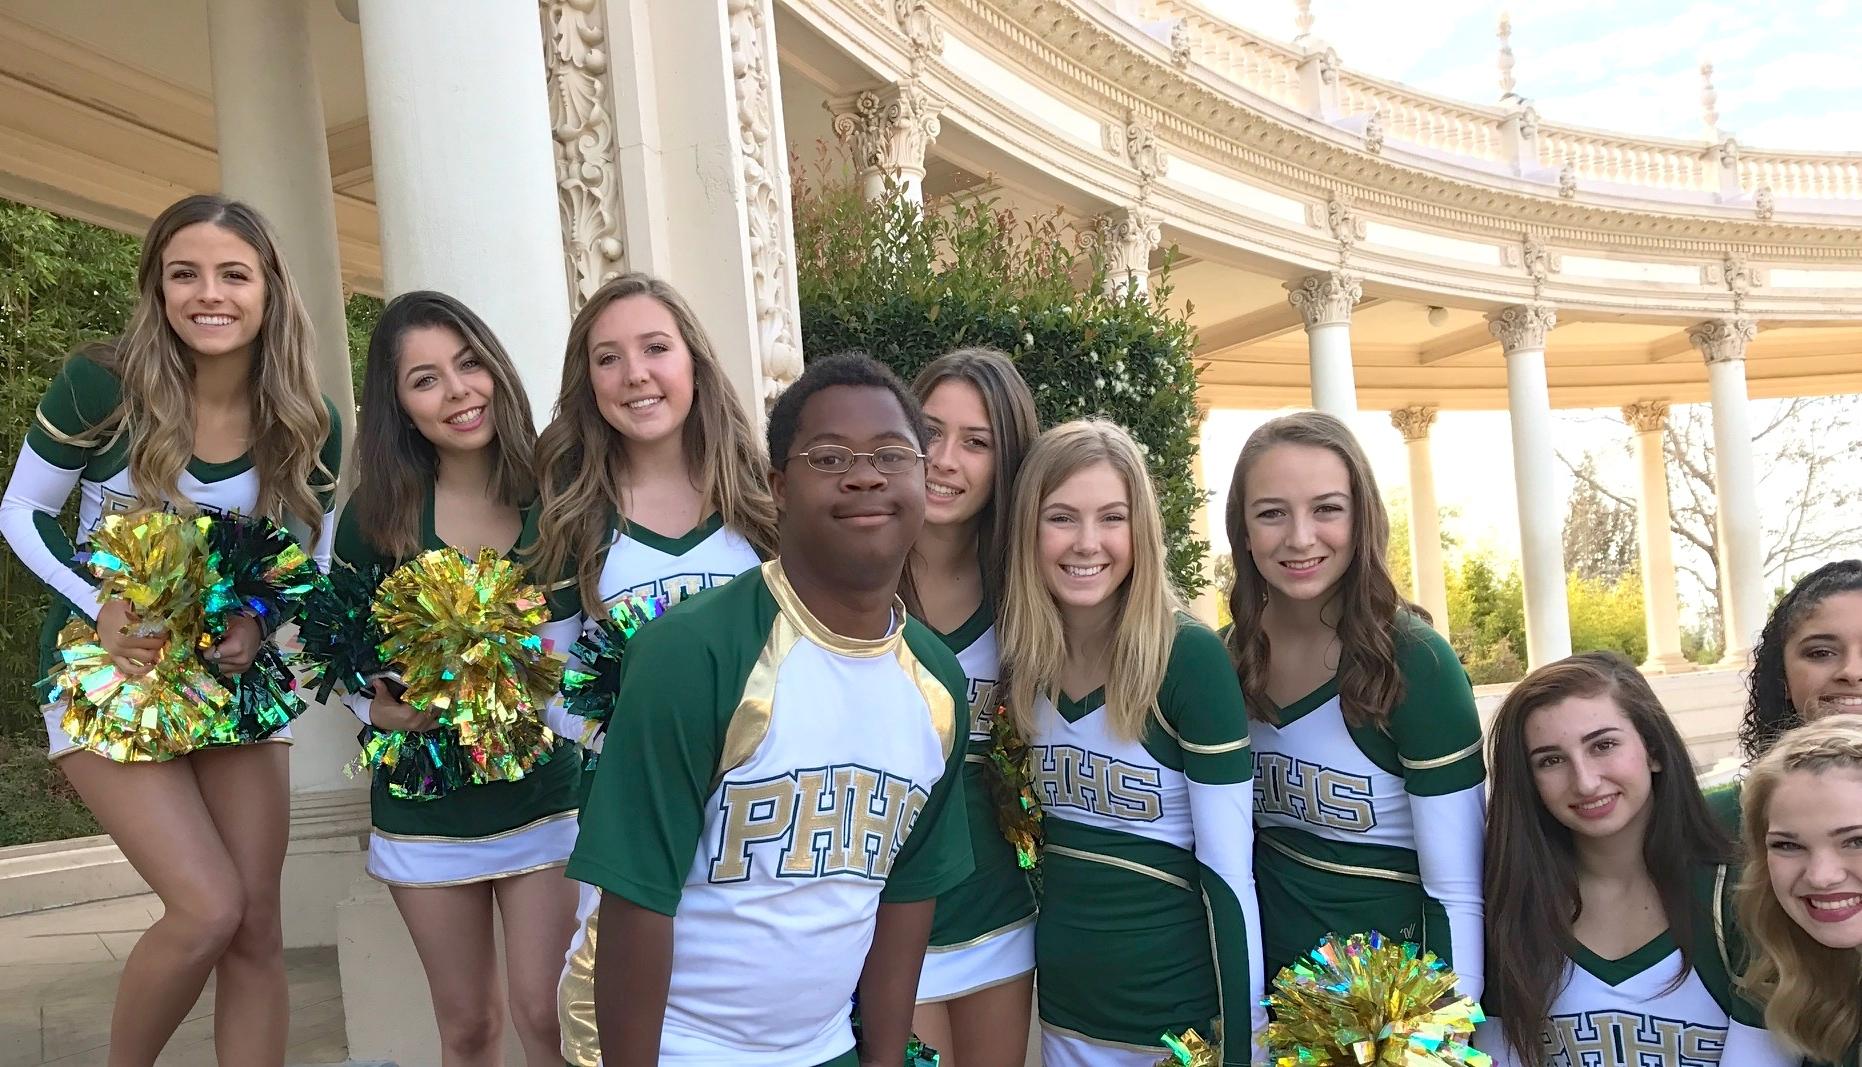 Love this high school lesbian cheerleaders